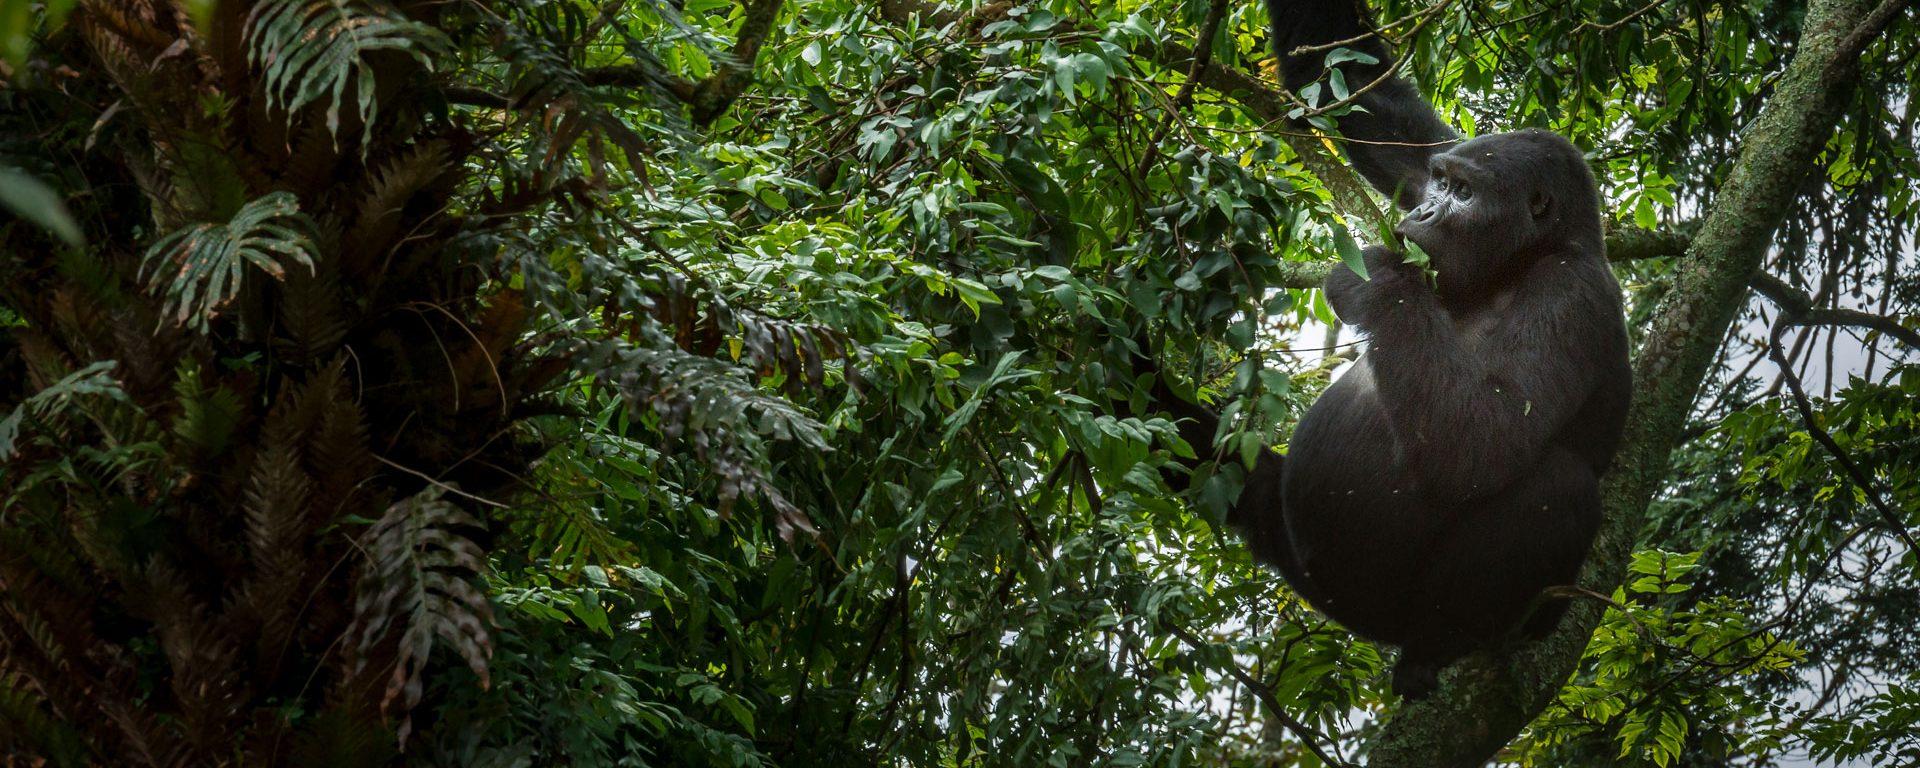 Mountain gorilla in tree in Bwindi Impenetrable Forest, Uganda